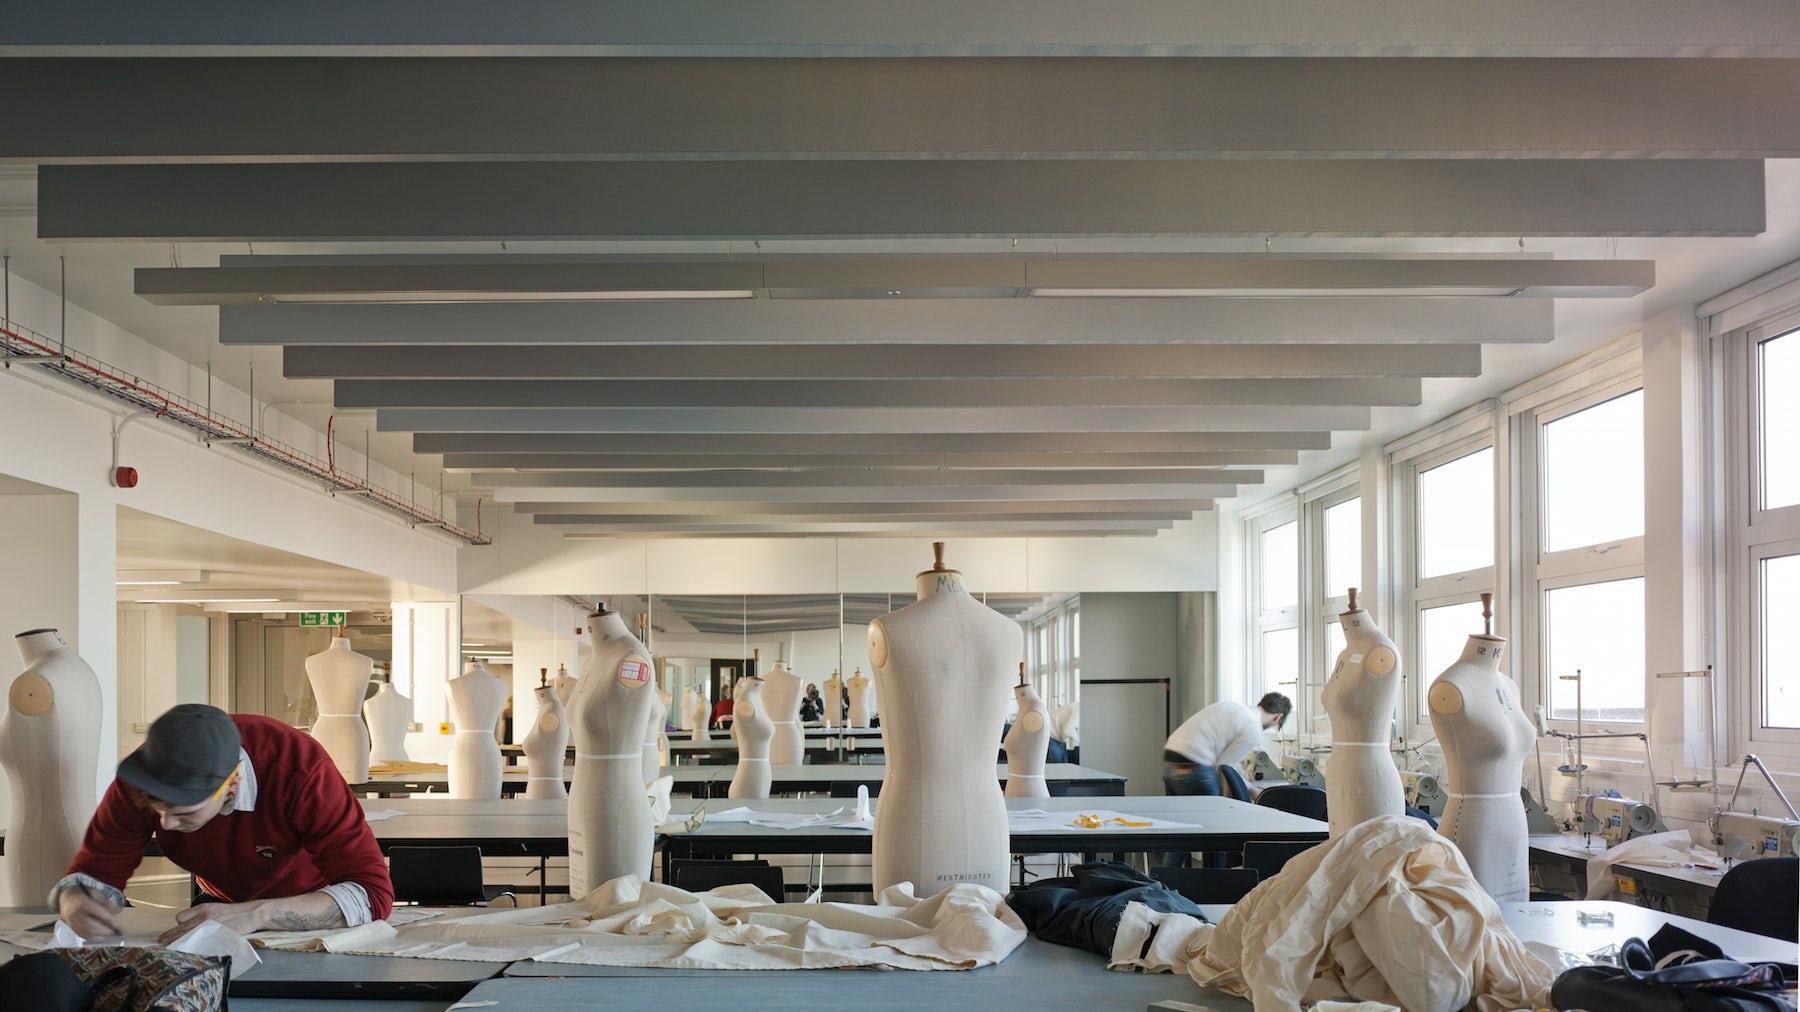 University of Westminster Fashion Studio | Source: Courtesy